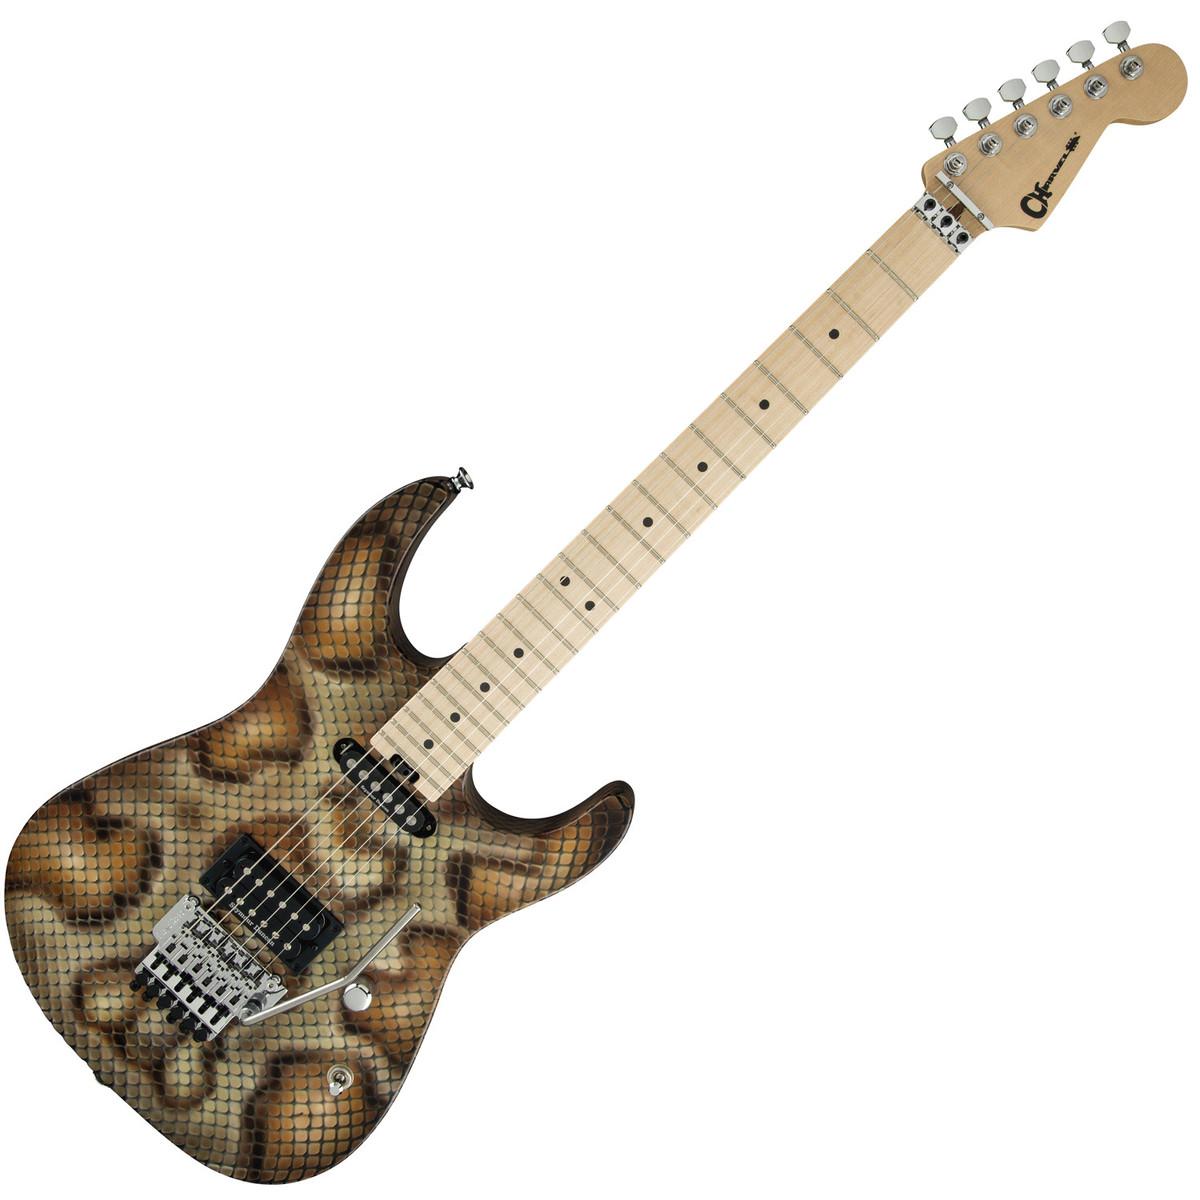 charvel warren demartini pro mod snakeskin at gear4music. Black Bedroom Furniture Sets. Home Design Ideas